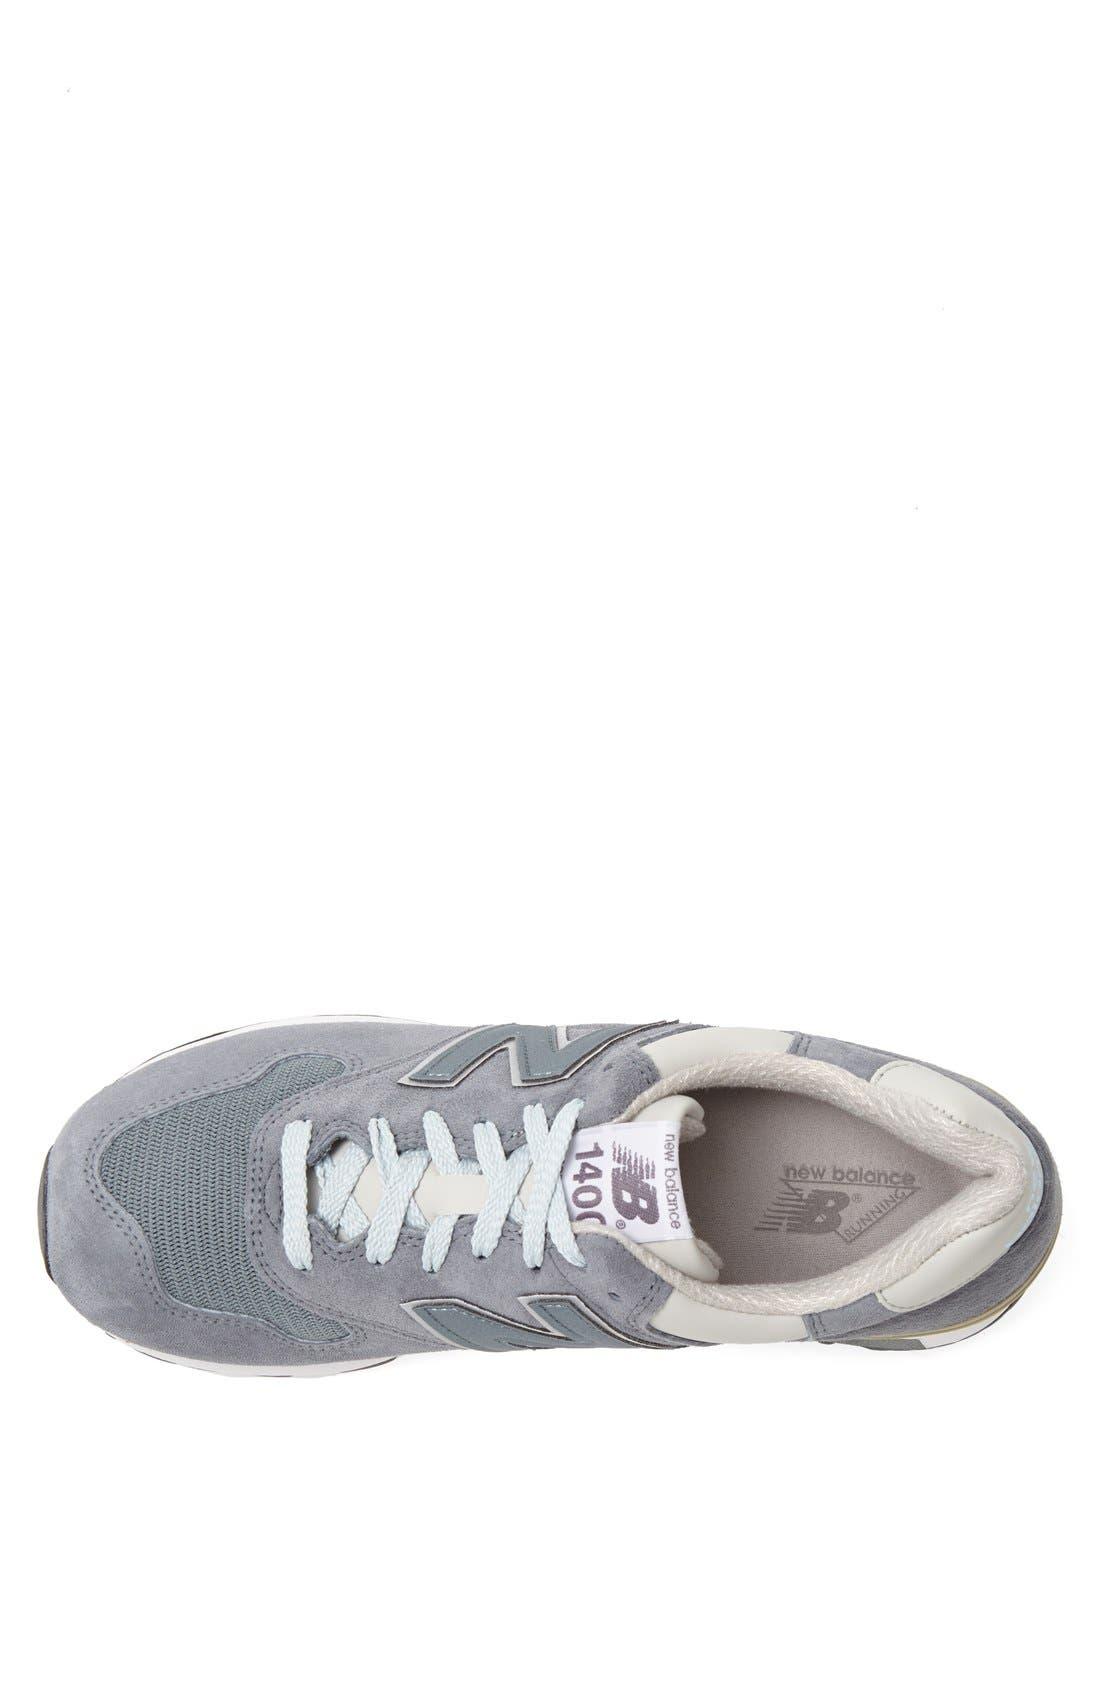 Alternate Image 3  - New Balance '1400' Suede Running Shoe (Men)